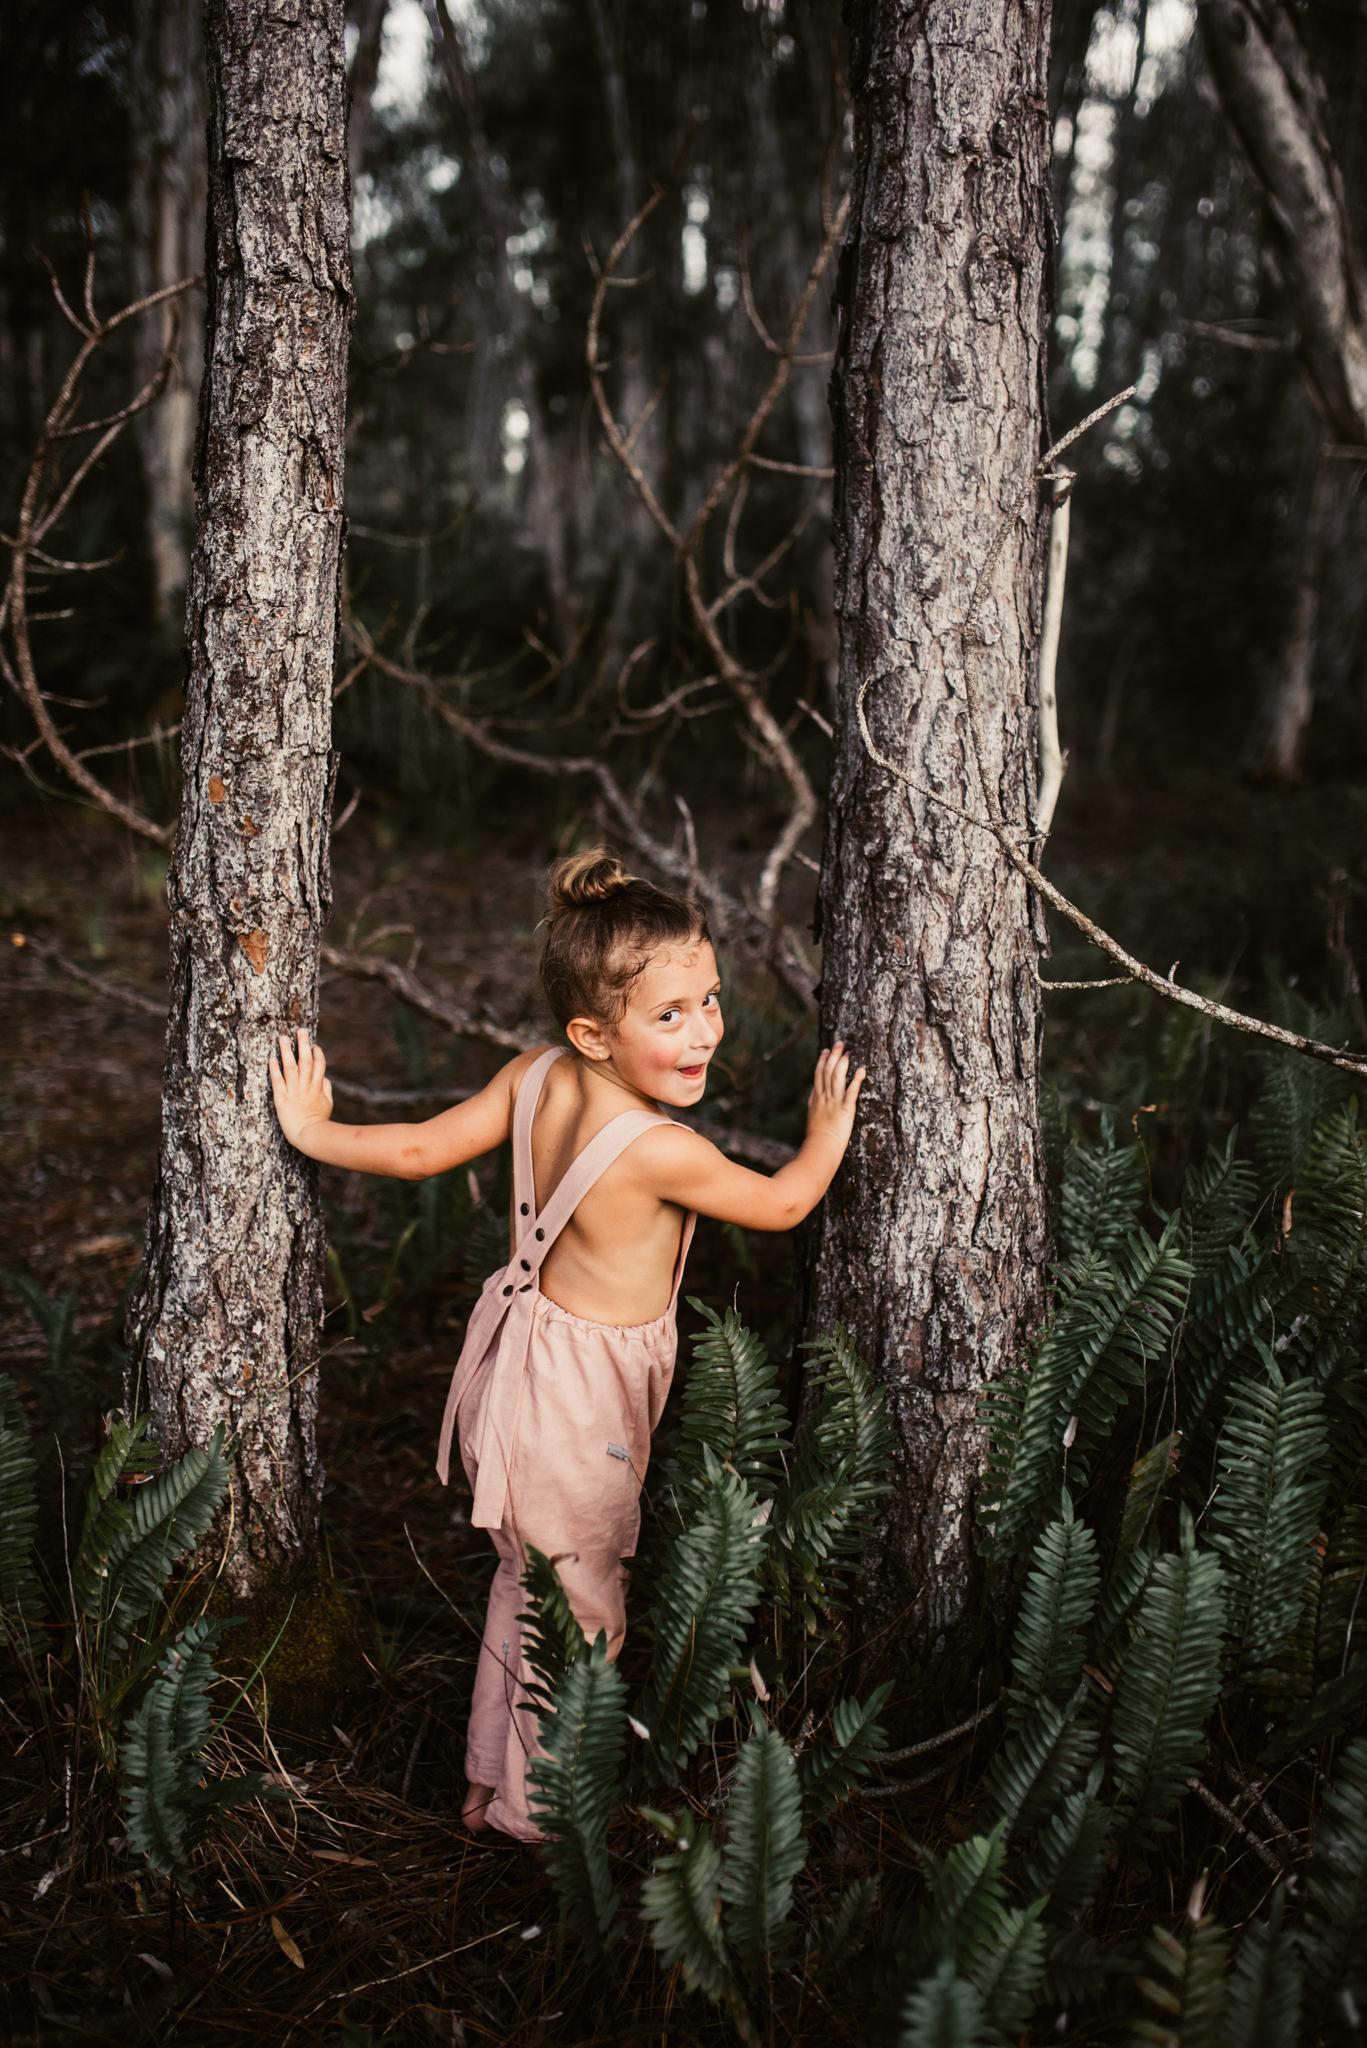 twyla jones photography - treasure coast florida - childrens adventure clothing commercial shoot--48.jpg